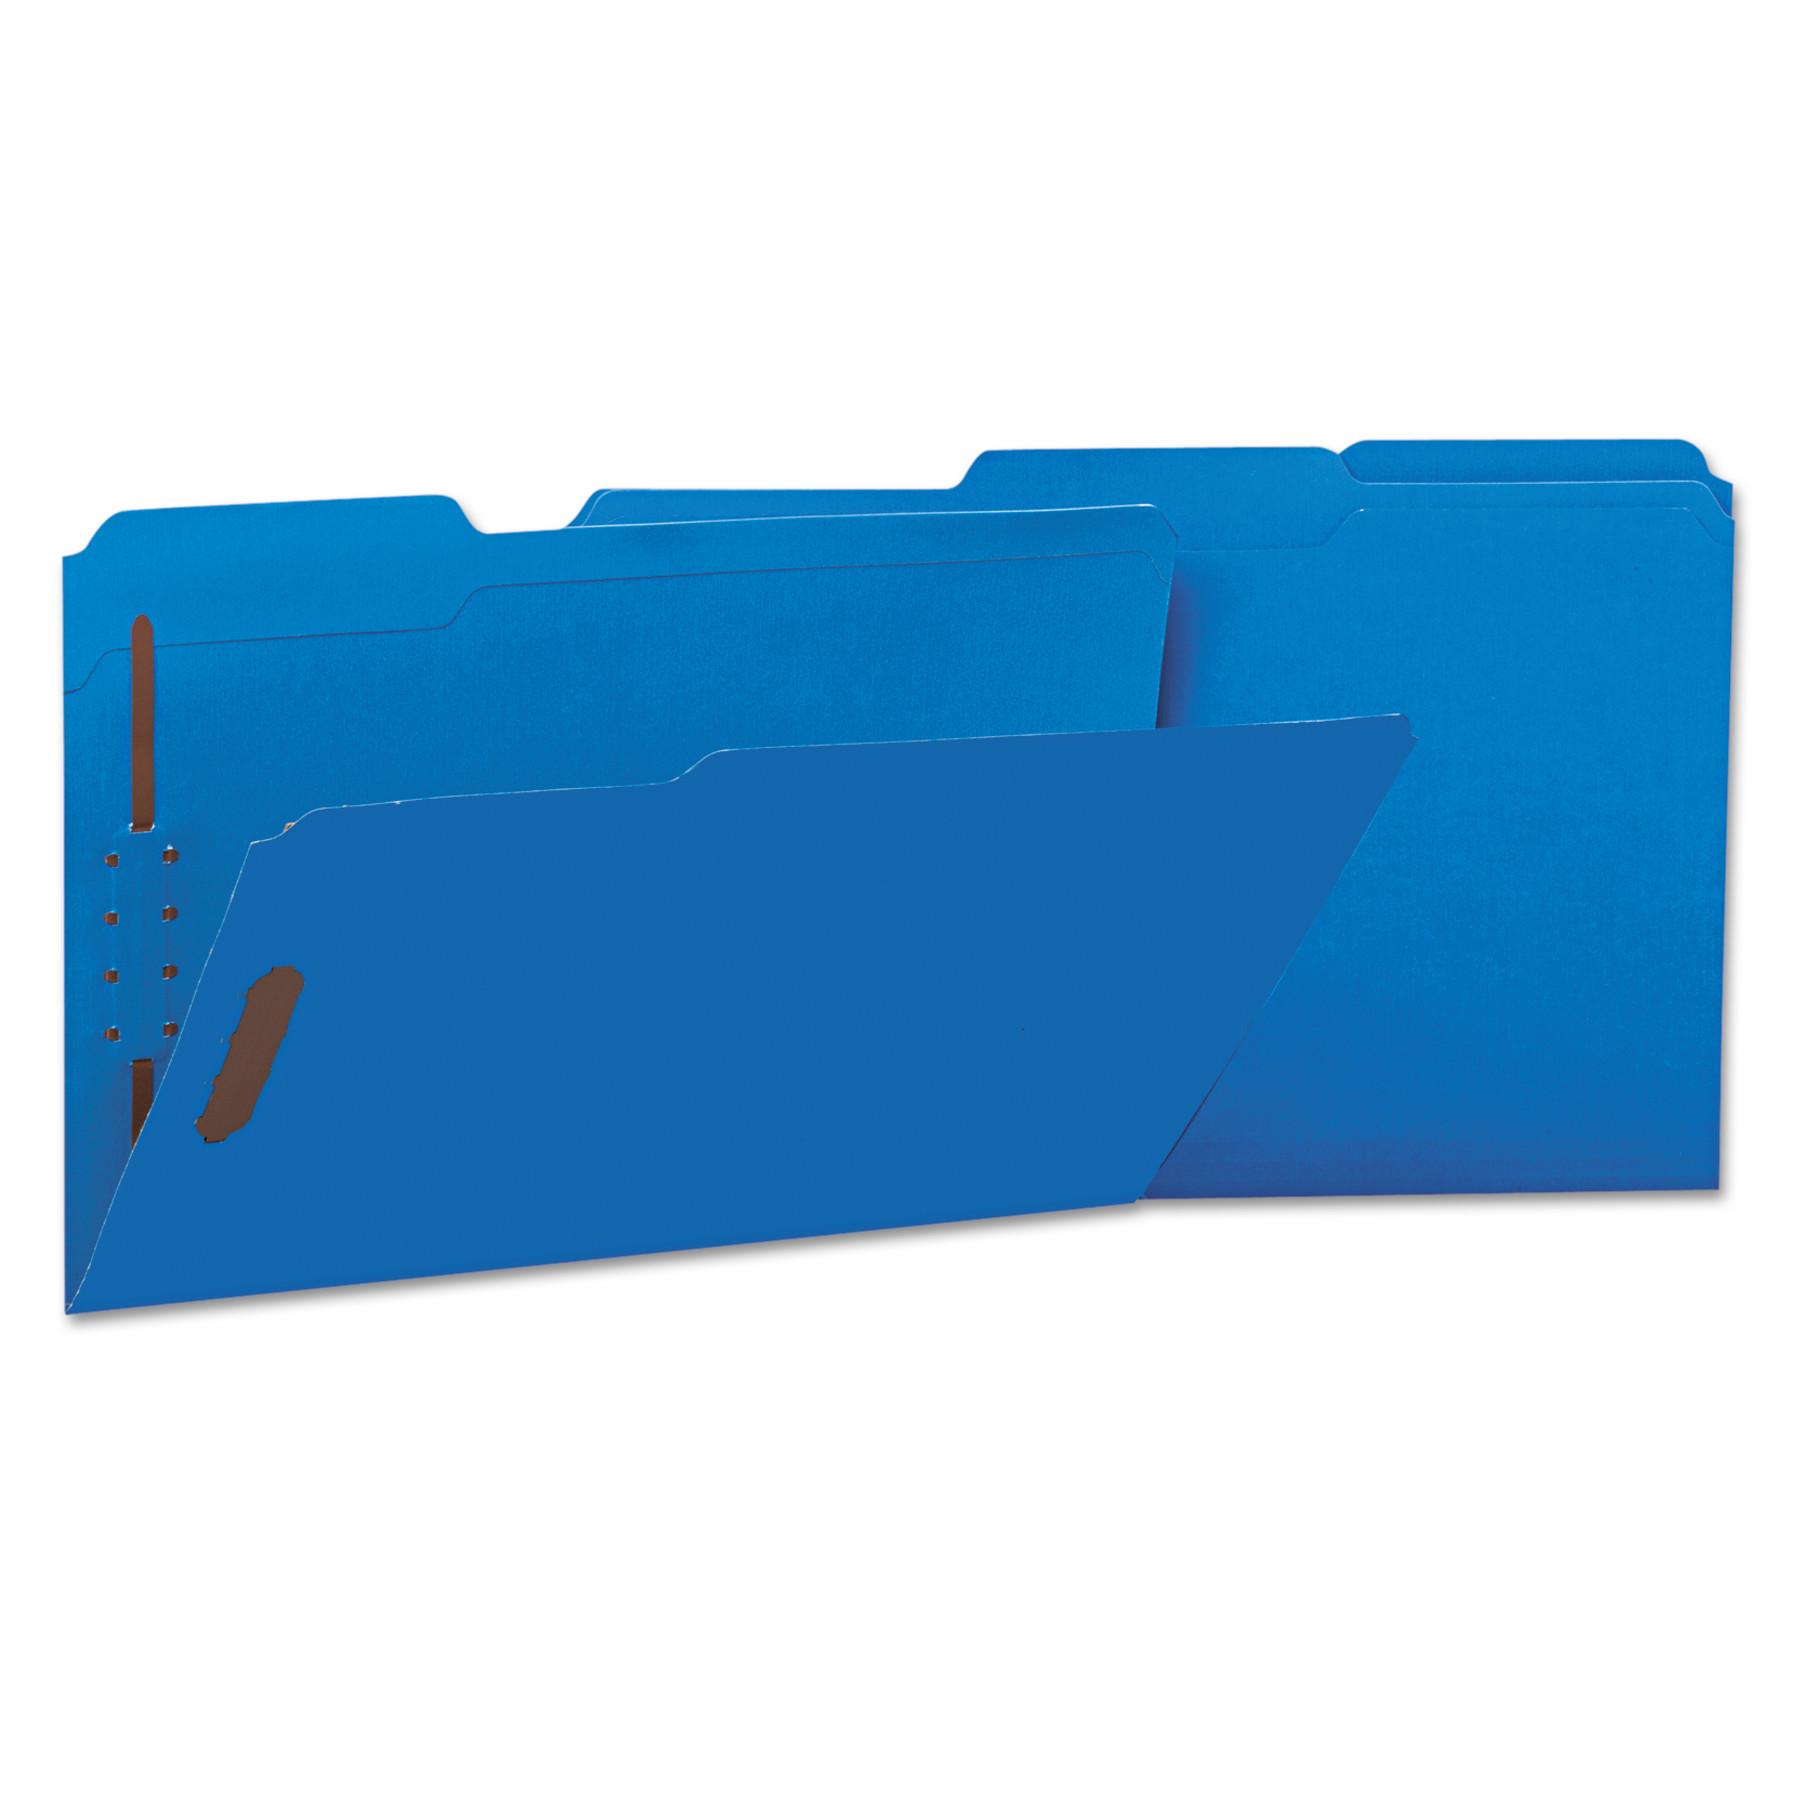 Deluxe Reinforced Top Tab Folders, 2 Fasteners, 1/3 Tab, Legal, Blue, 50/Box